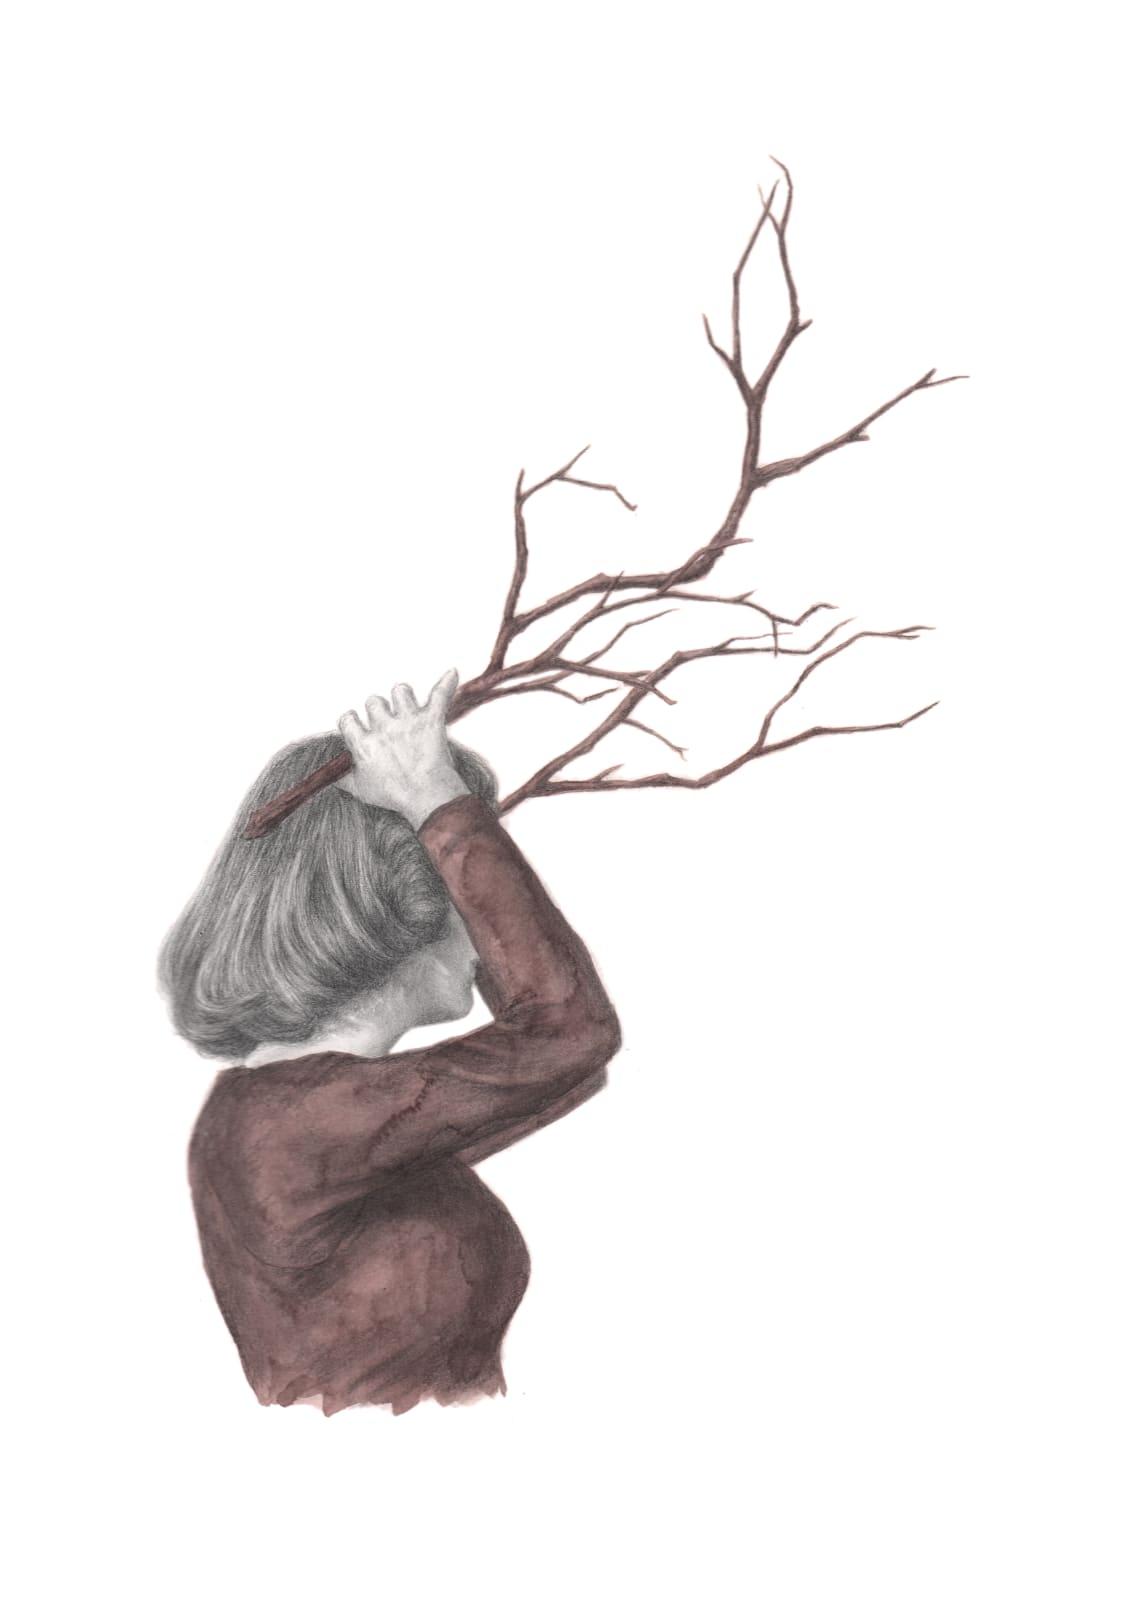 Rachel Goodyear, Antlers, 2021